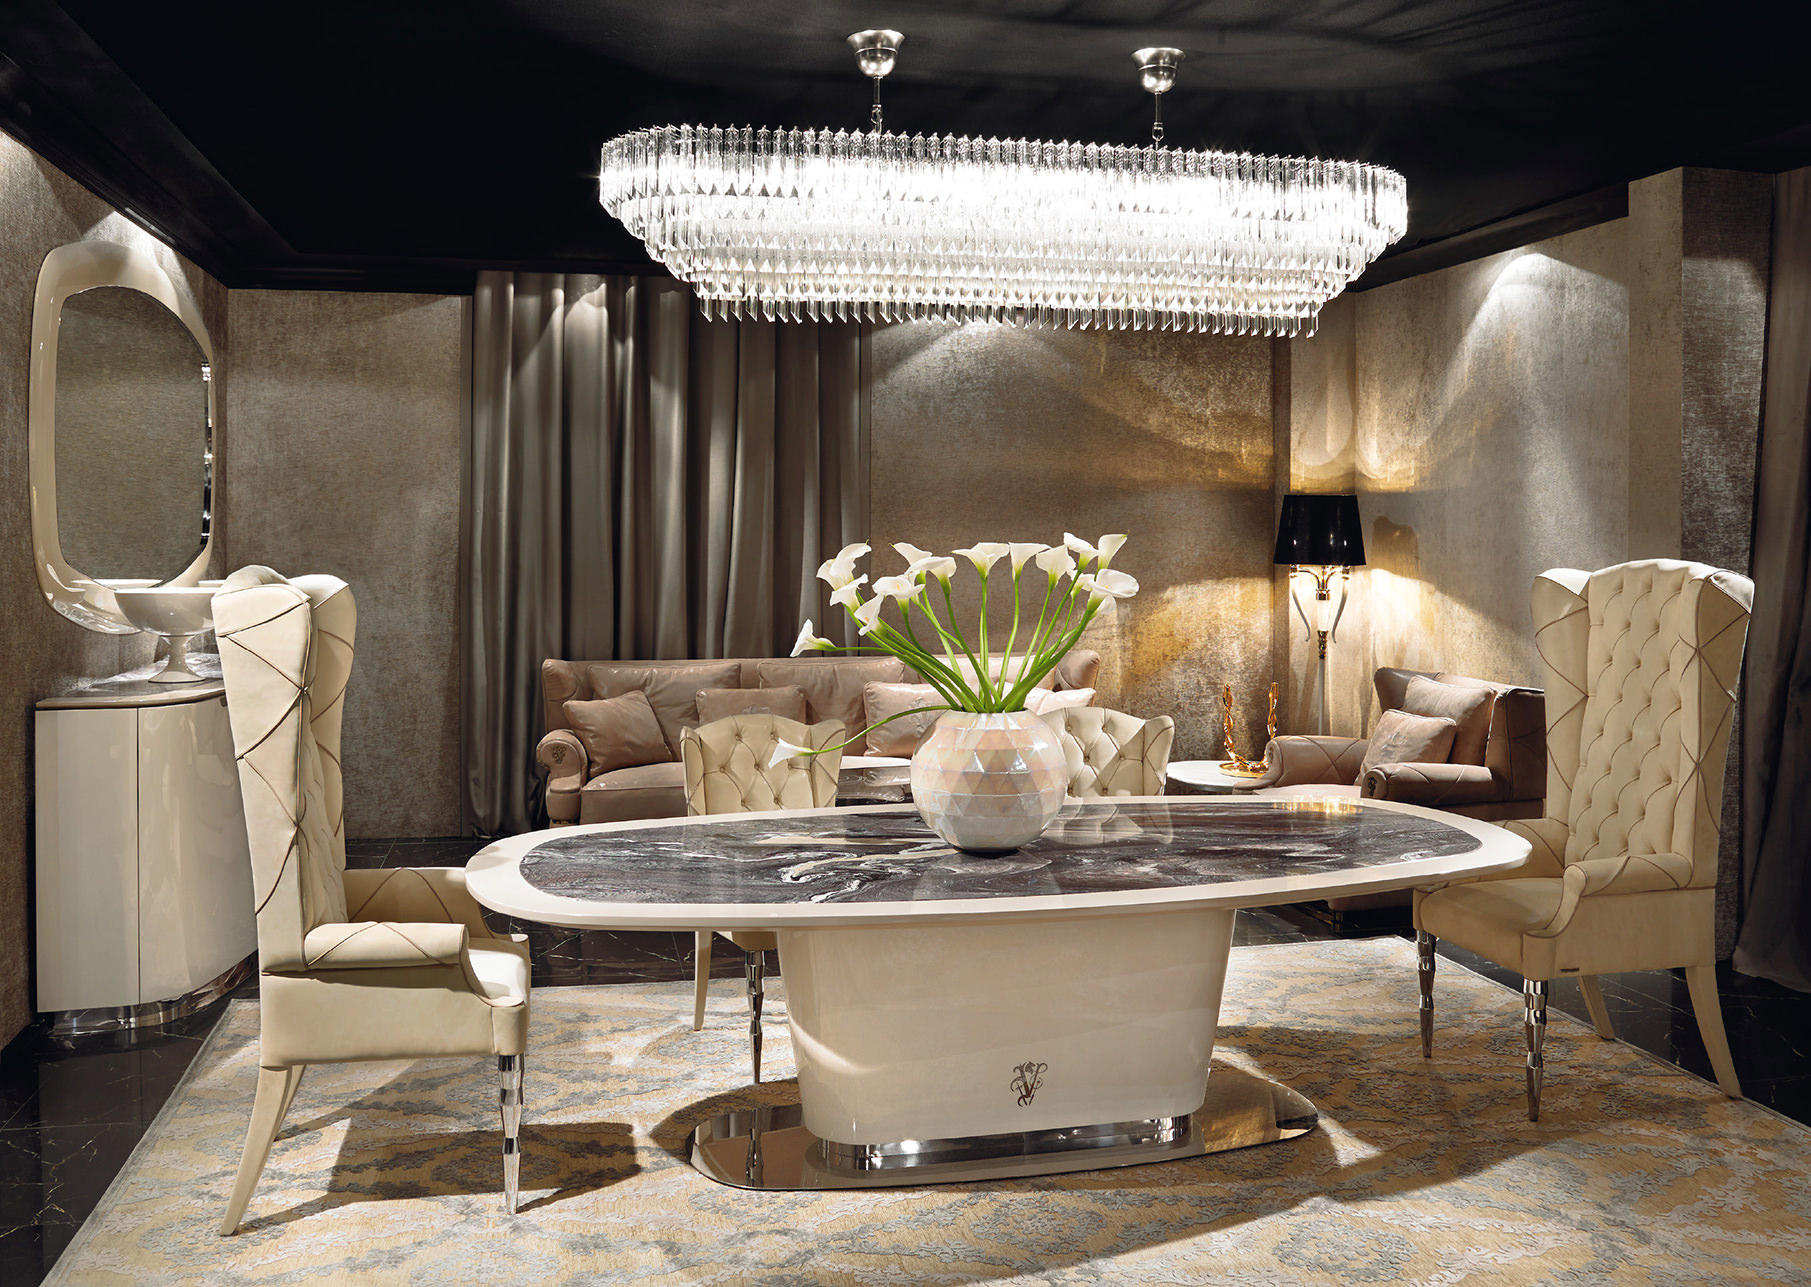 Brunswick Dining Room Visionnaire Home Philosophy #4F6110 1811 1287 Sala Da Pranzo Reggia Di Caserta